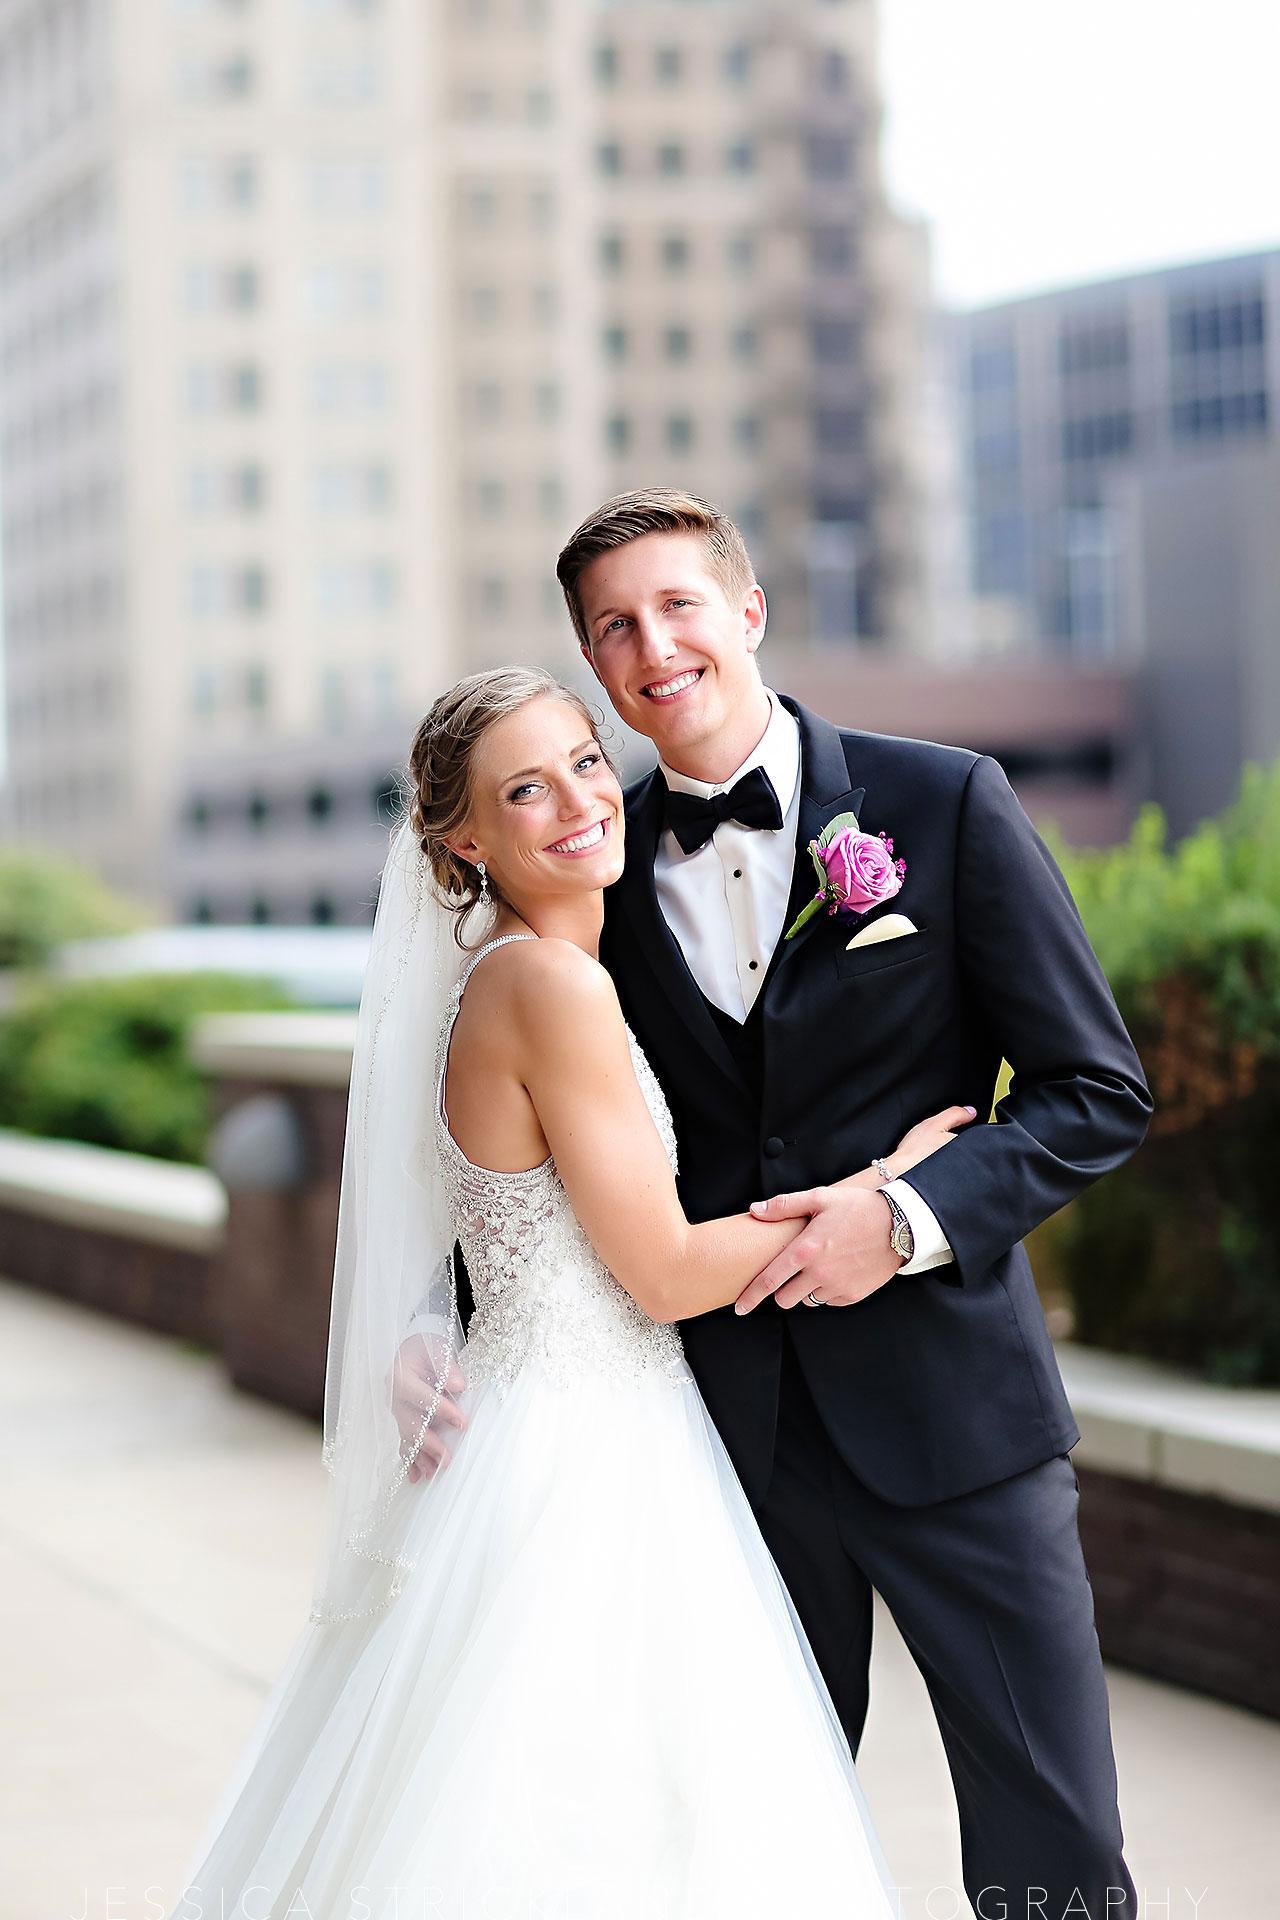 Serra Alex Regions Tower Indianapolis Wedding 264 watermarked